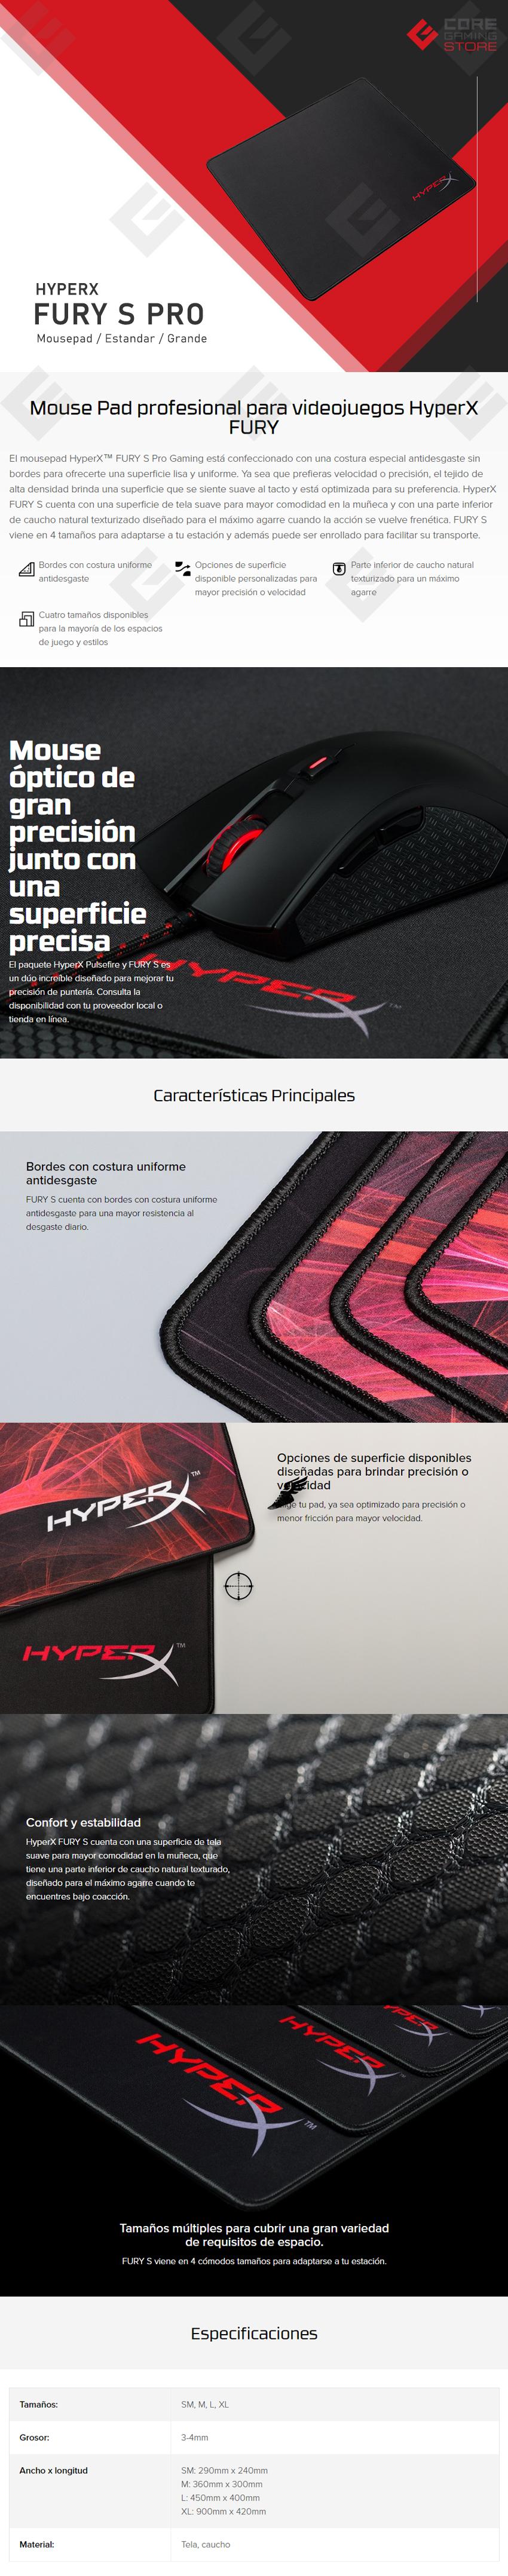 Mousepad HyperX Fury S Pro, Standar Edition, Grande, 450x400x4mm - HX-MPFS-L